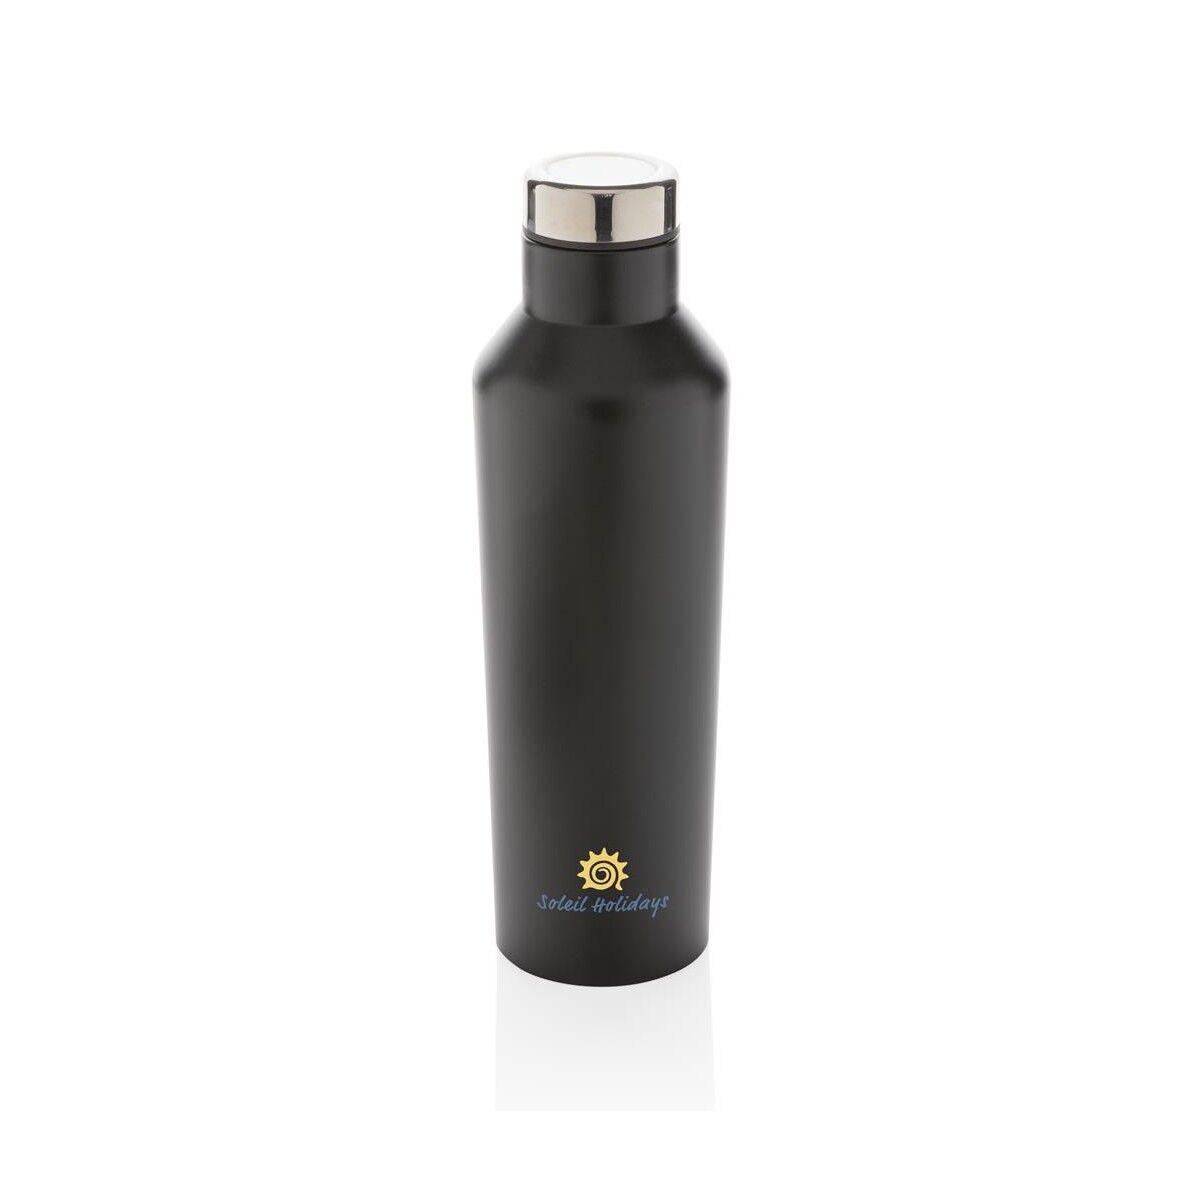 Auckland vacuum Stainless Steel Bottle - Black